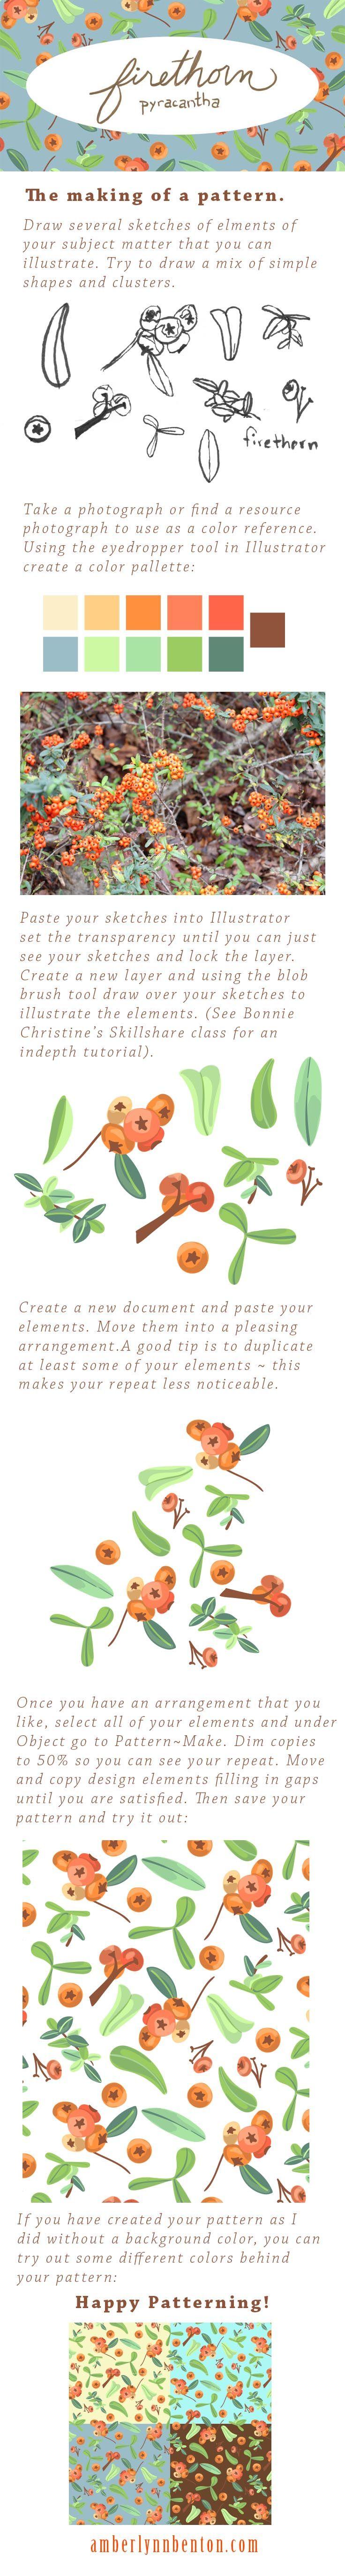 A brief illustrated pattern making tutorial using Adobe Illustrator.